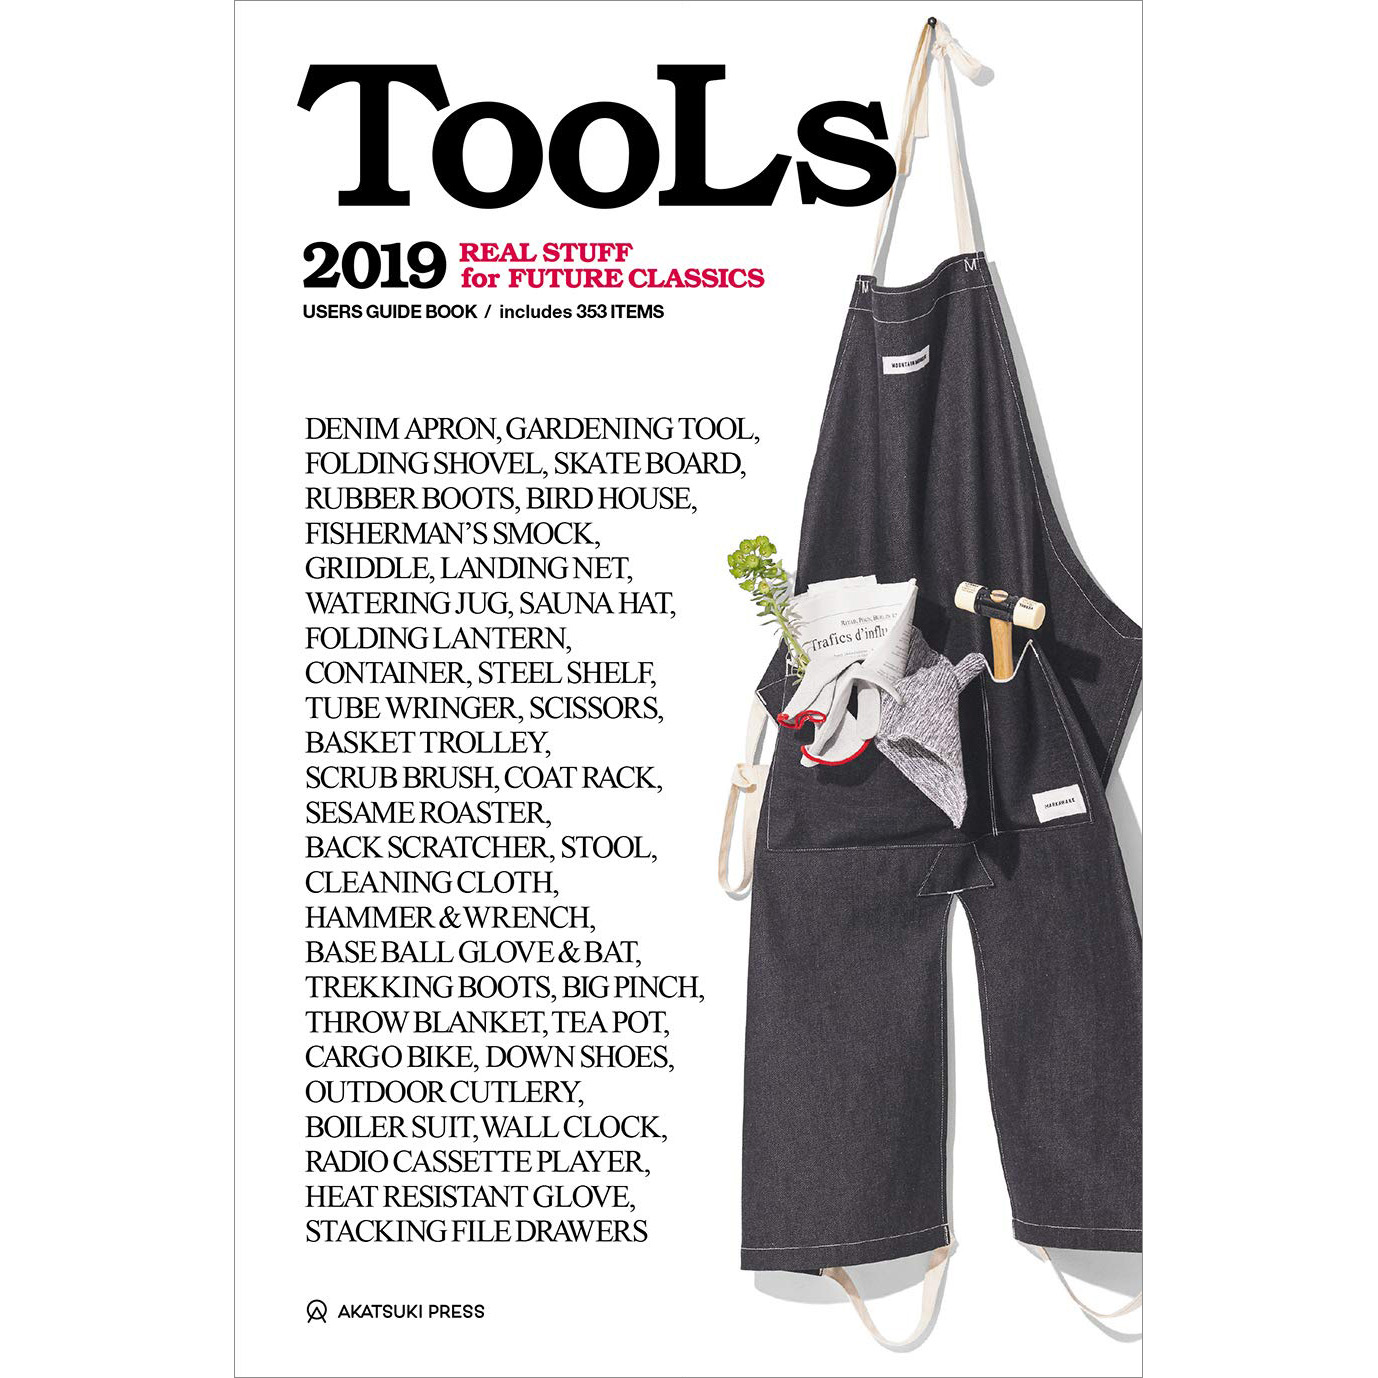 Tools 2019 – Real Stuff For Future Classics